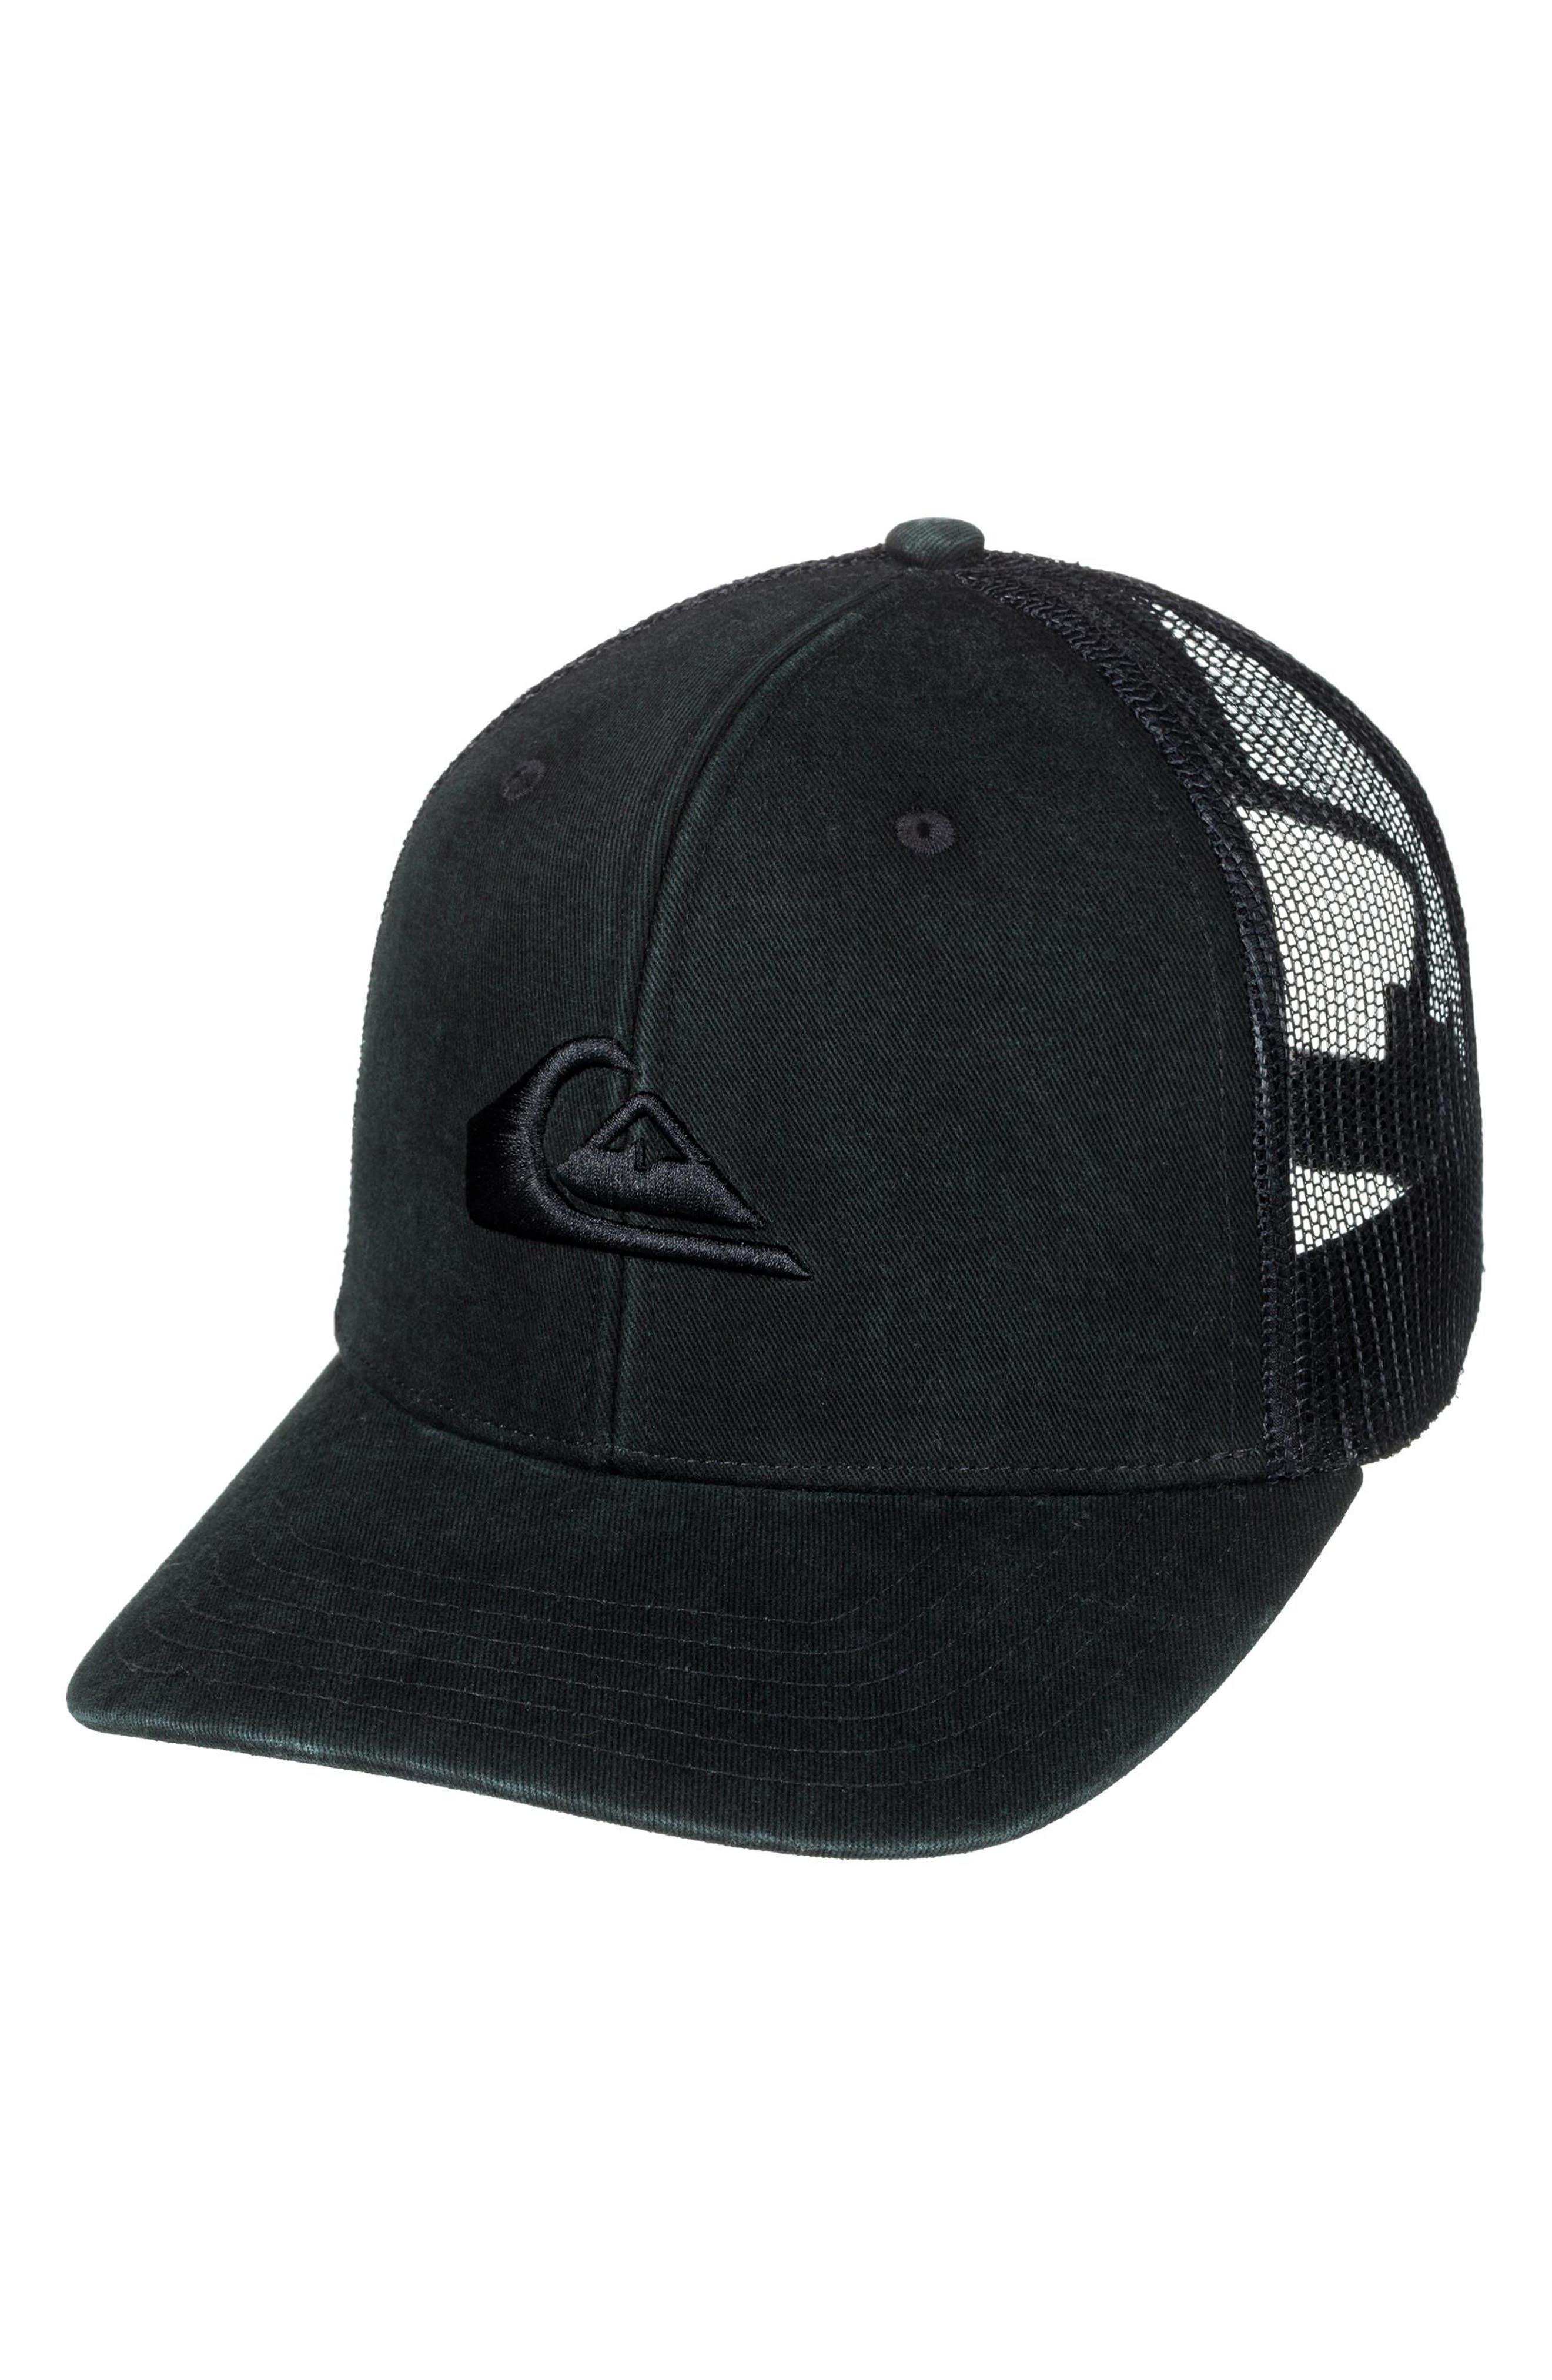 Grounder Trucker Hat,                             Main thumbnail 1, color,                             002